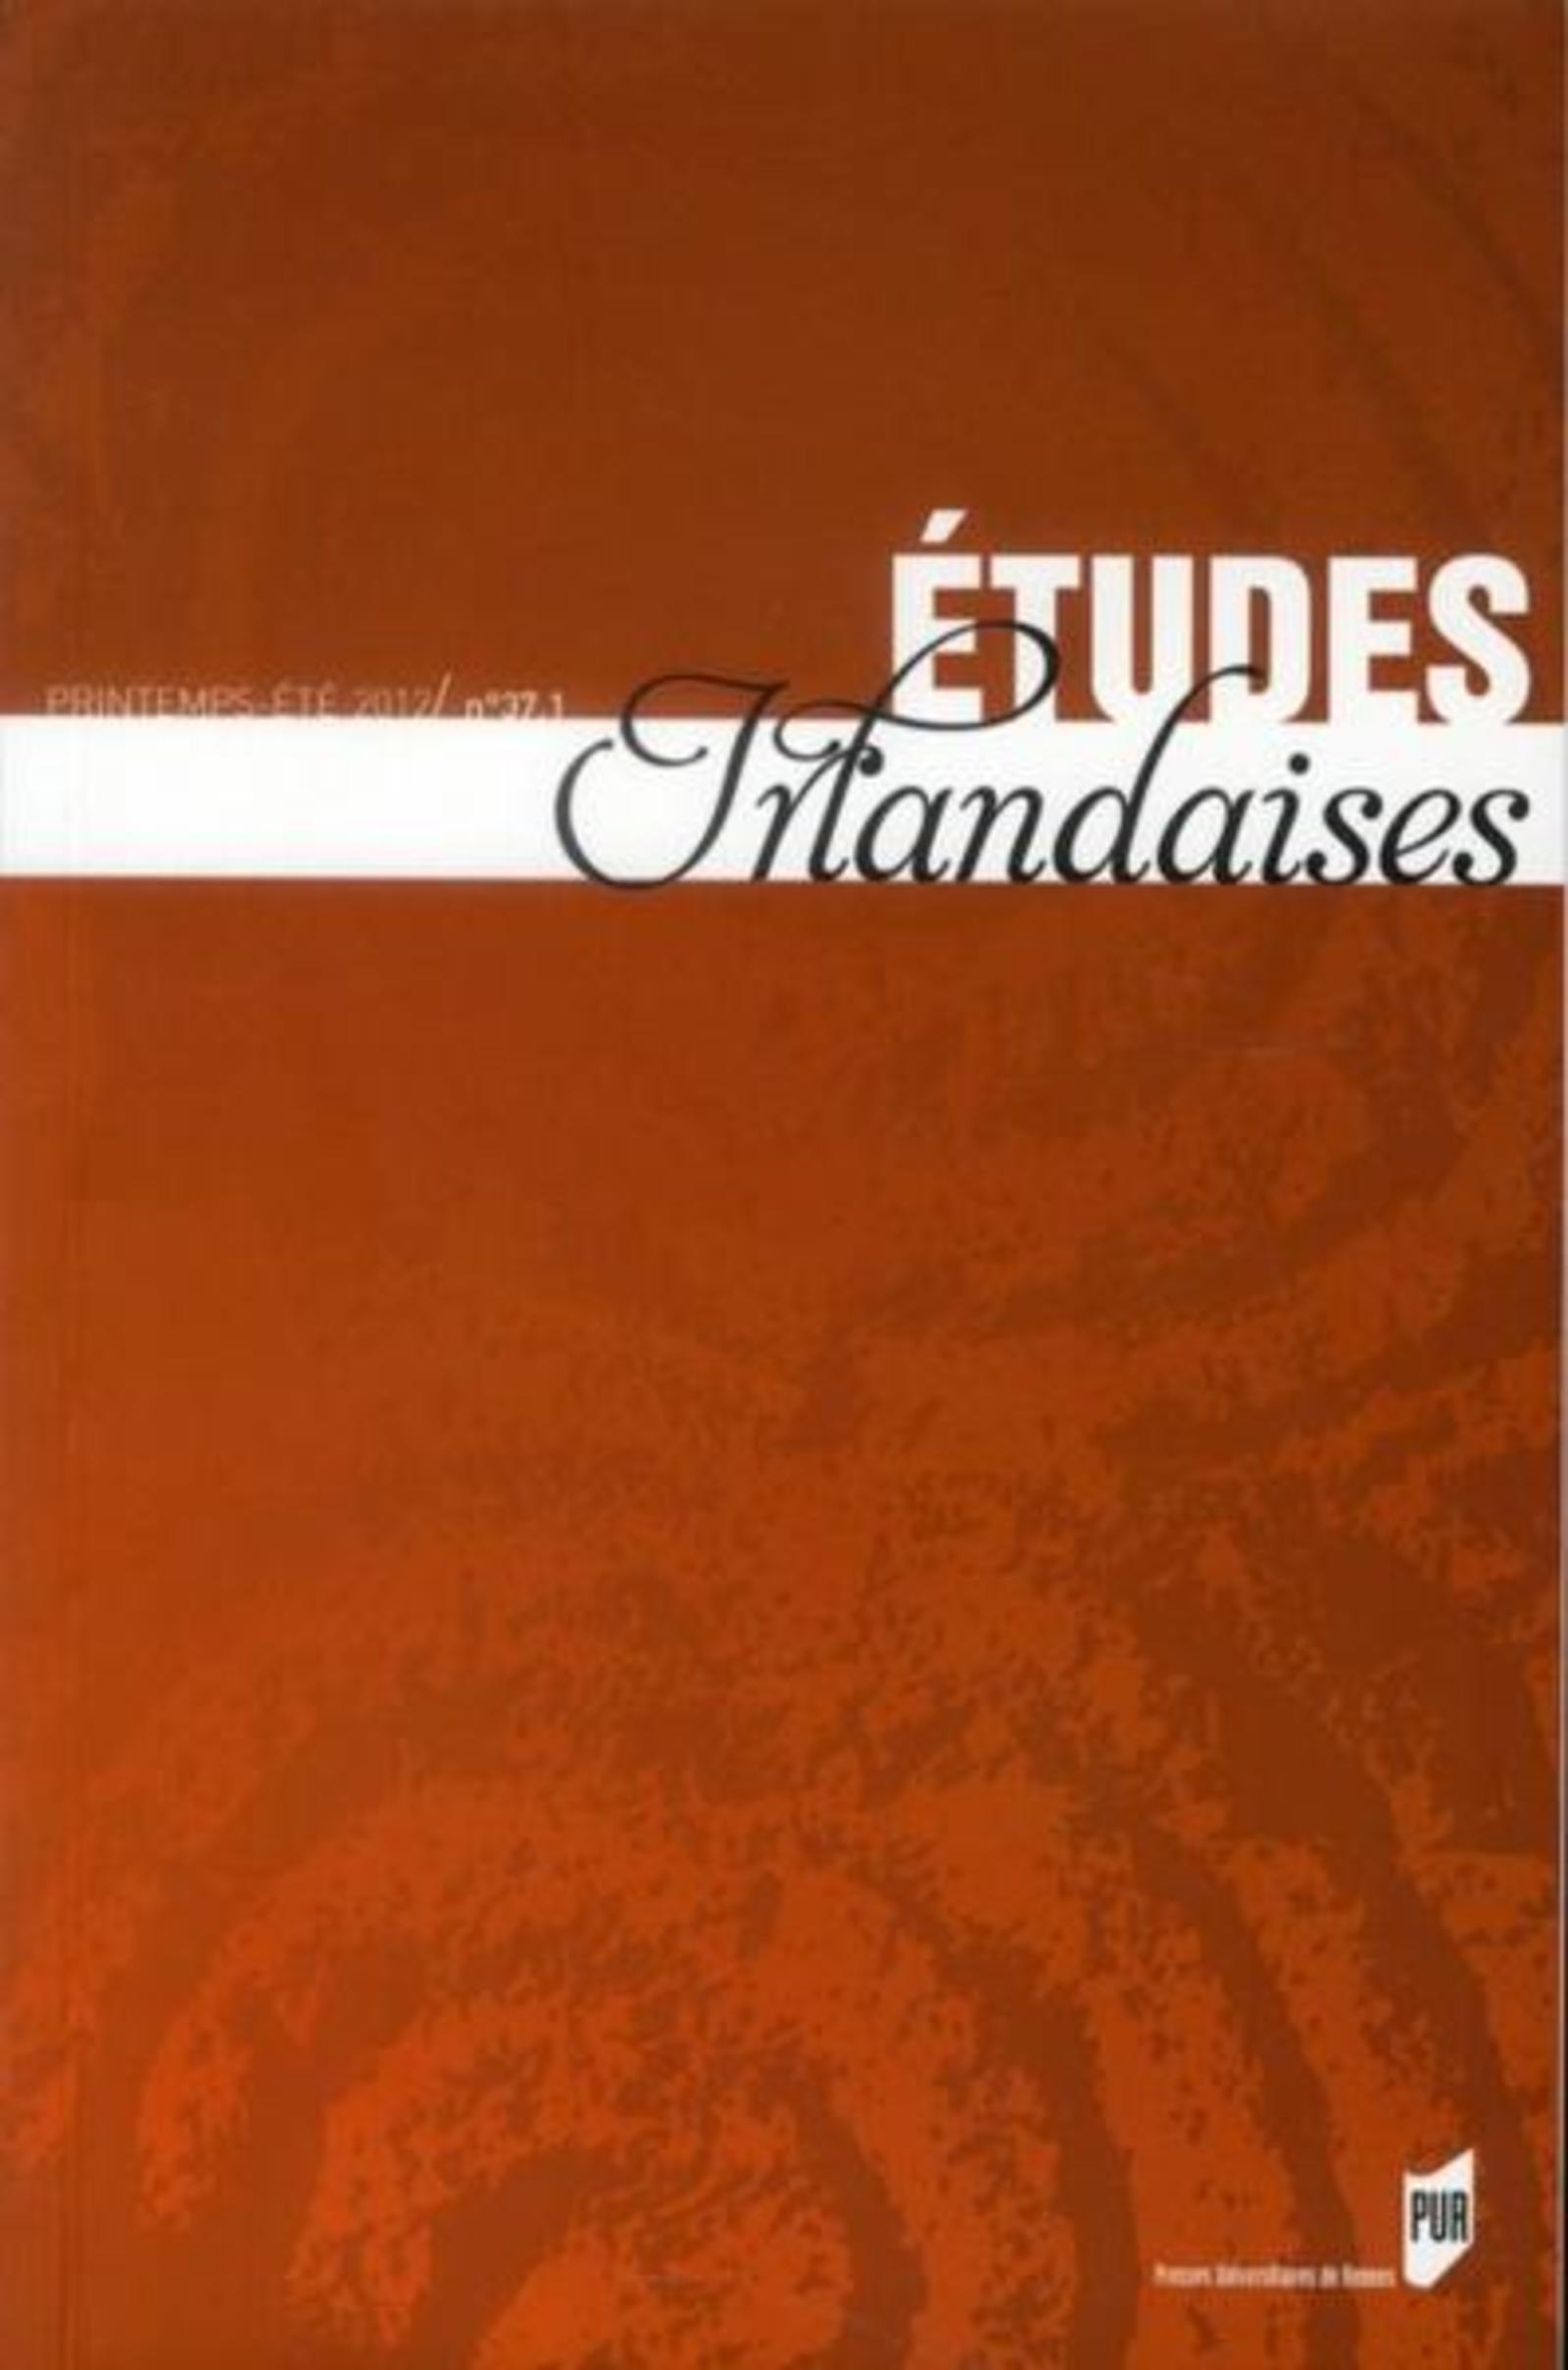 ETUDES IRLANDAISES 37 1